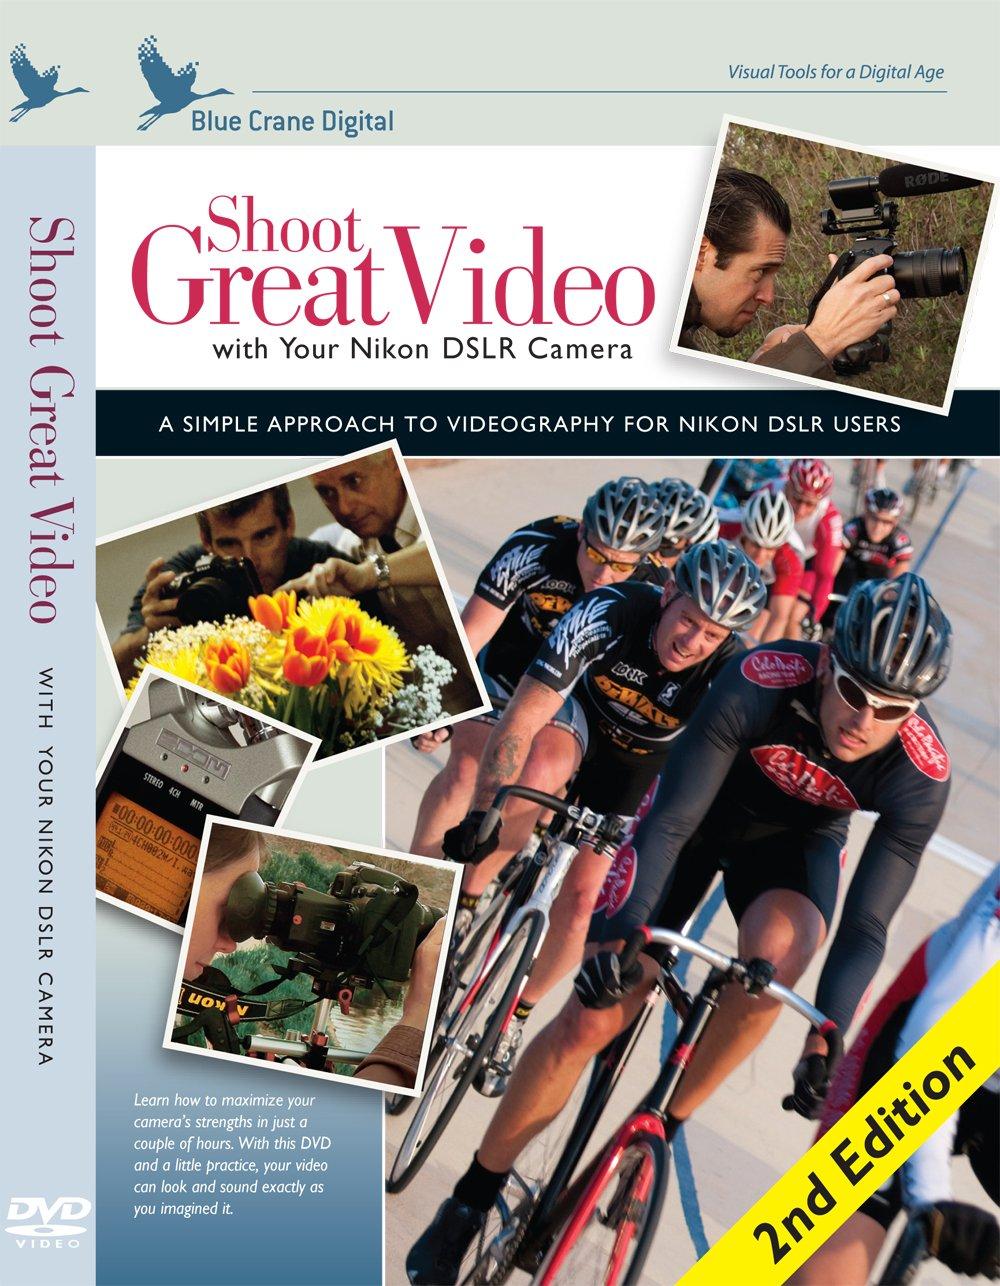 Blue Crane Digital Shoot Great Video with Your Nikon DSLR Camera 2nd Edition (zBC208) by Blue Crane Digital